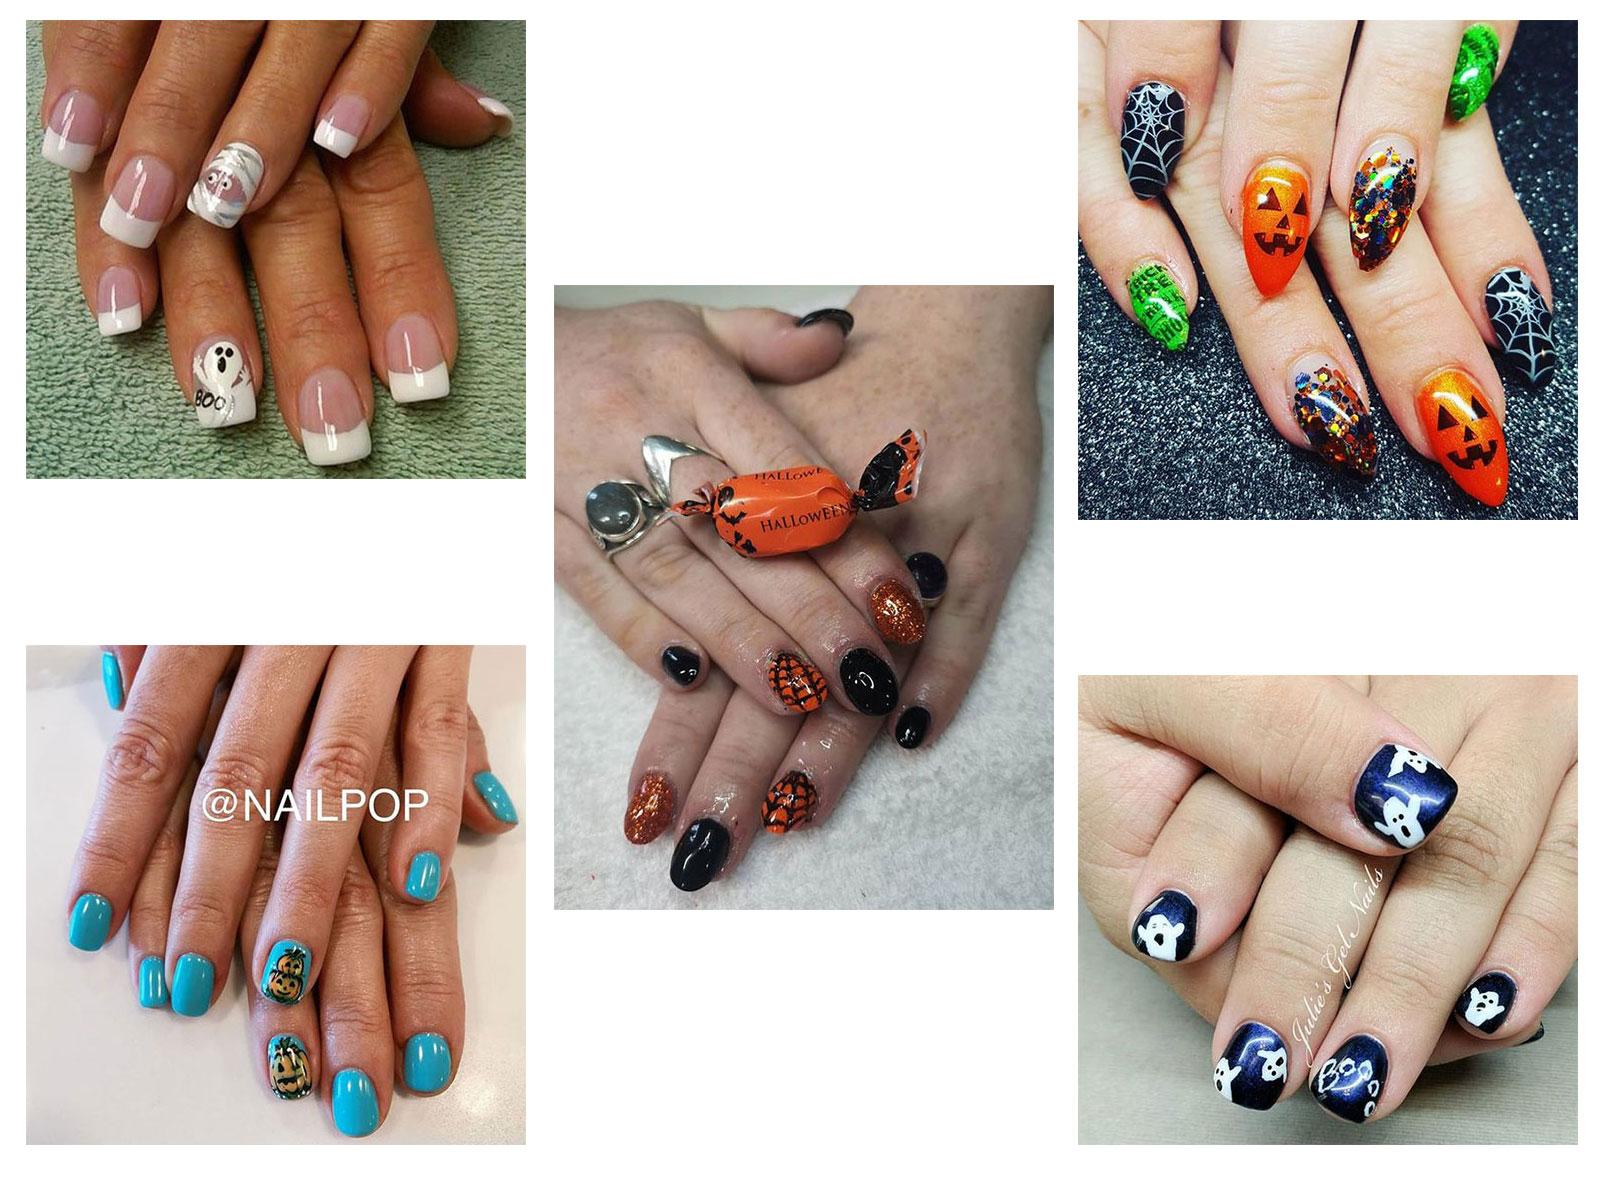 30-Halloween-Gel-Nails-Art-Designs-Ideas-Trends-2019-F